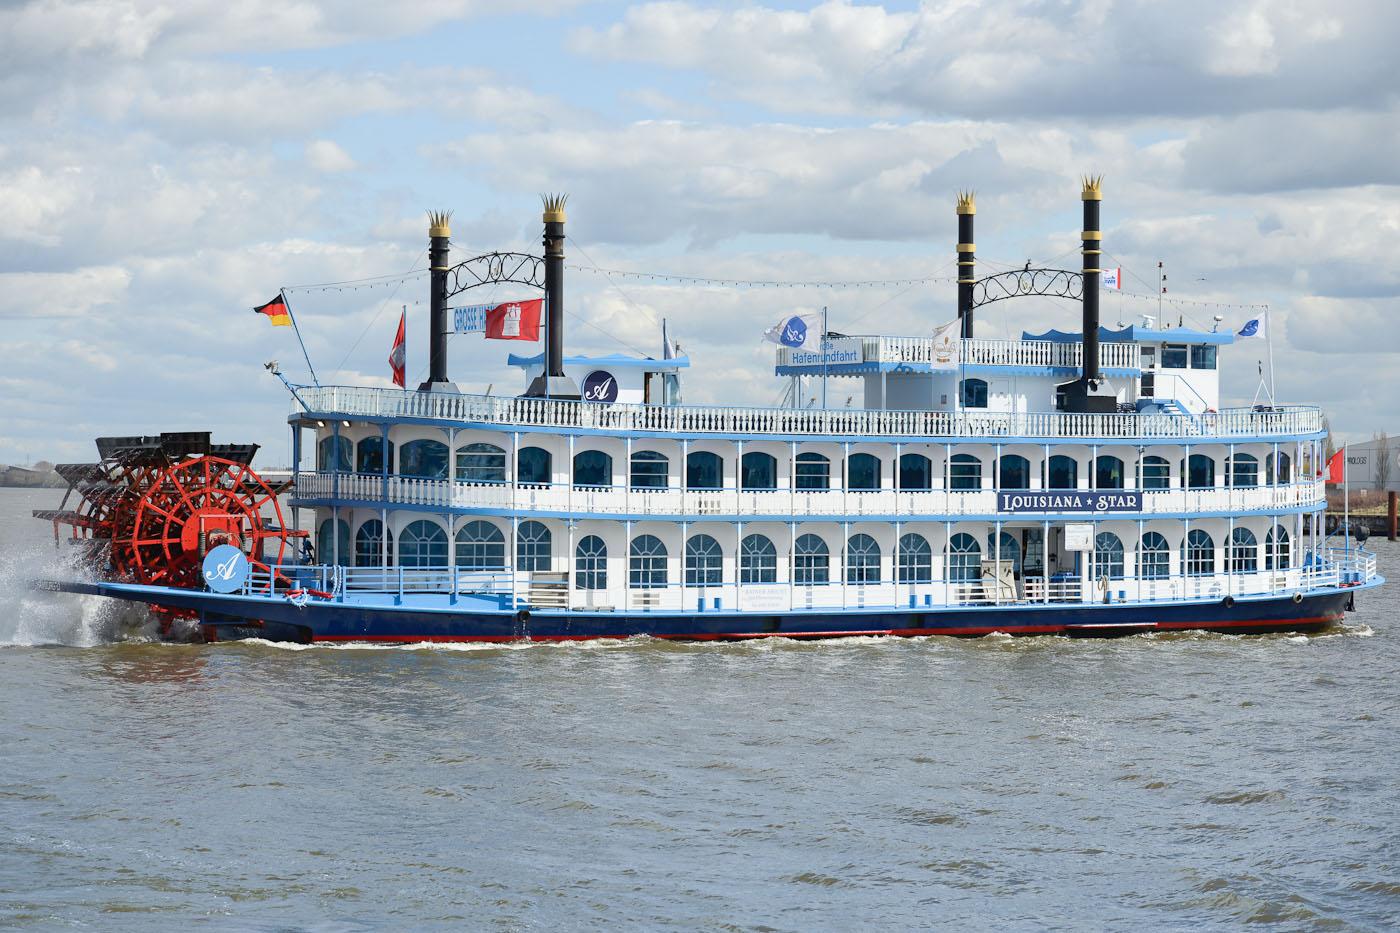 Foto ID 15042608 Lousiana Star Hafenrundfahrt Hamburg